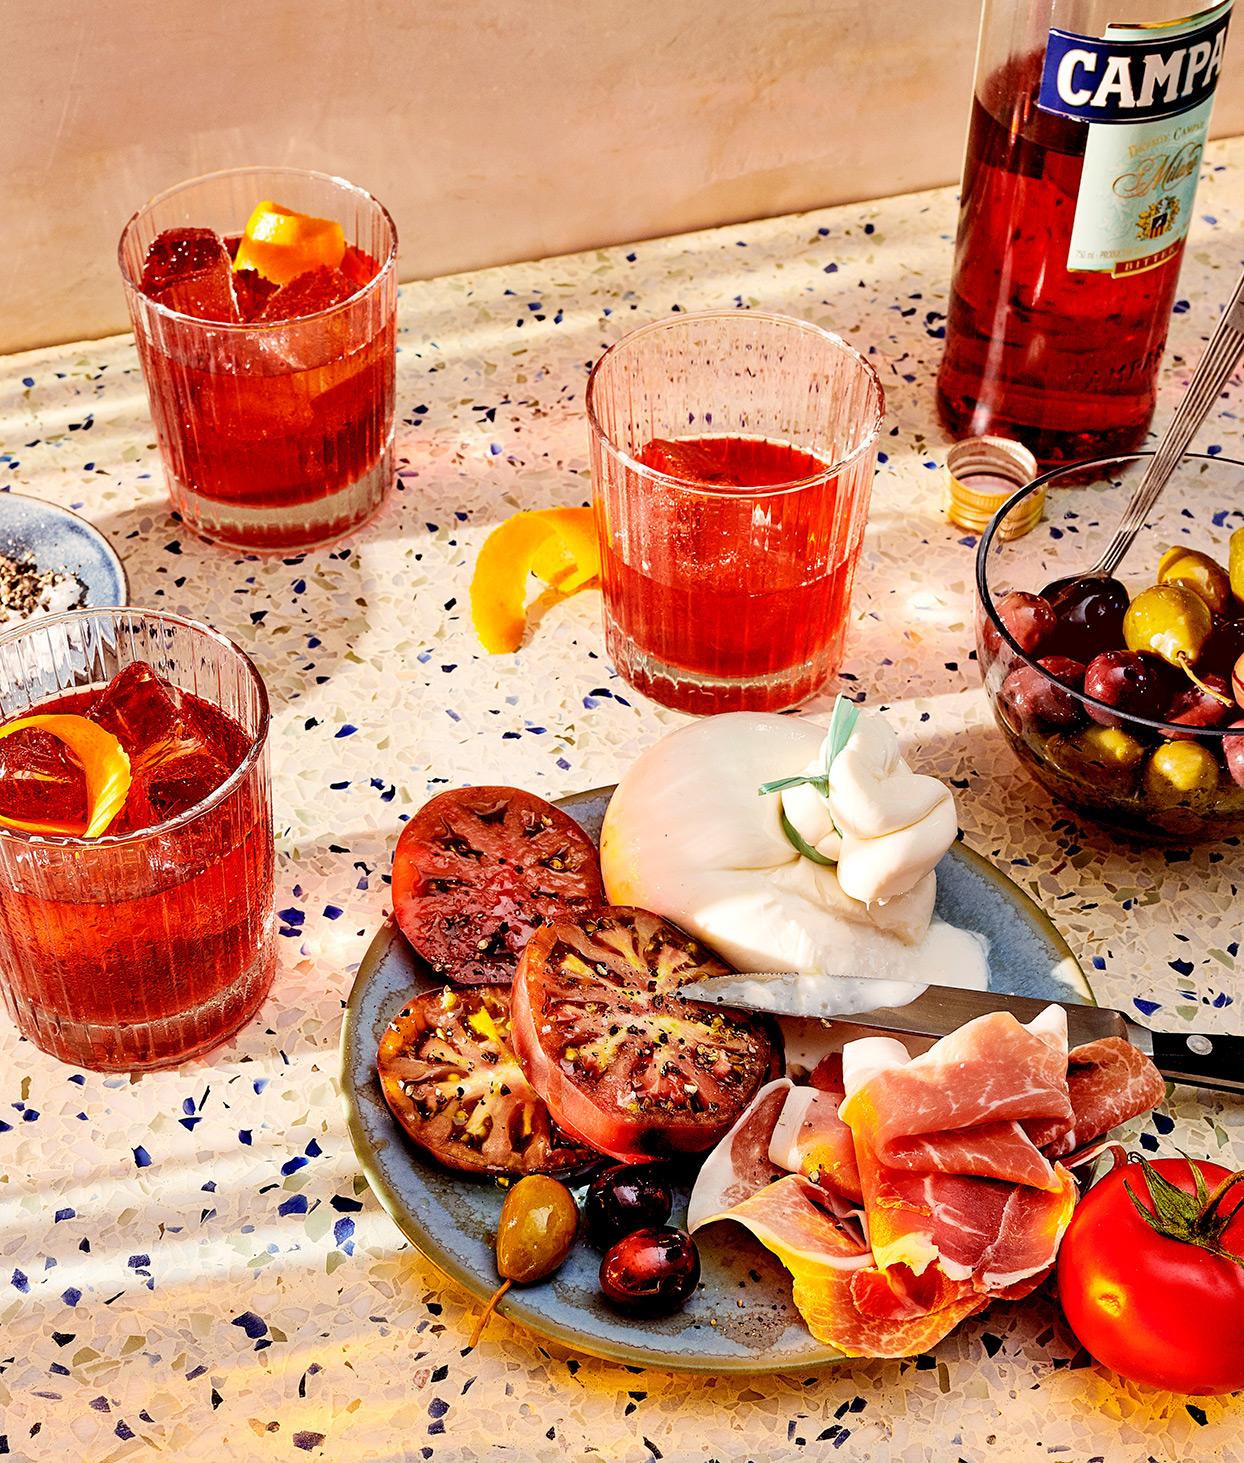 aperitivo drinks tomatoes prosciutto olives terrazzo countertop knife plate